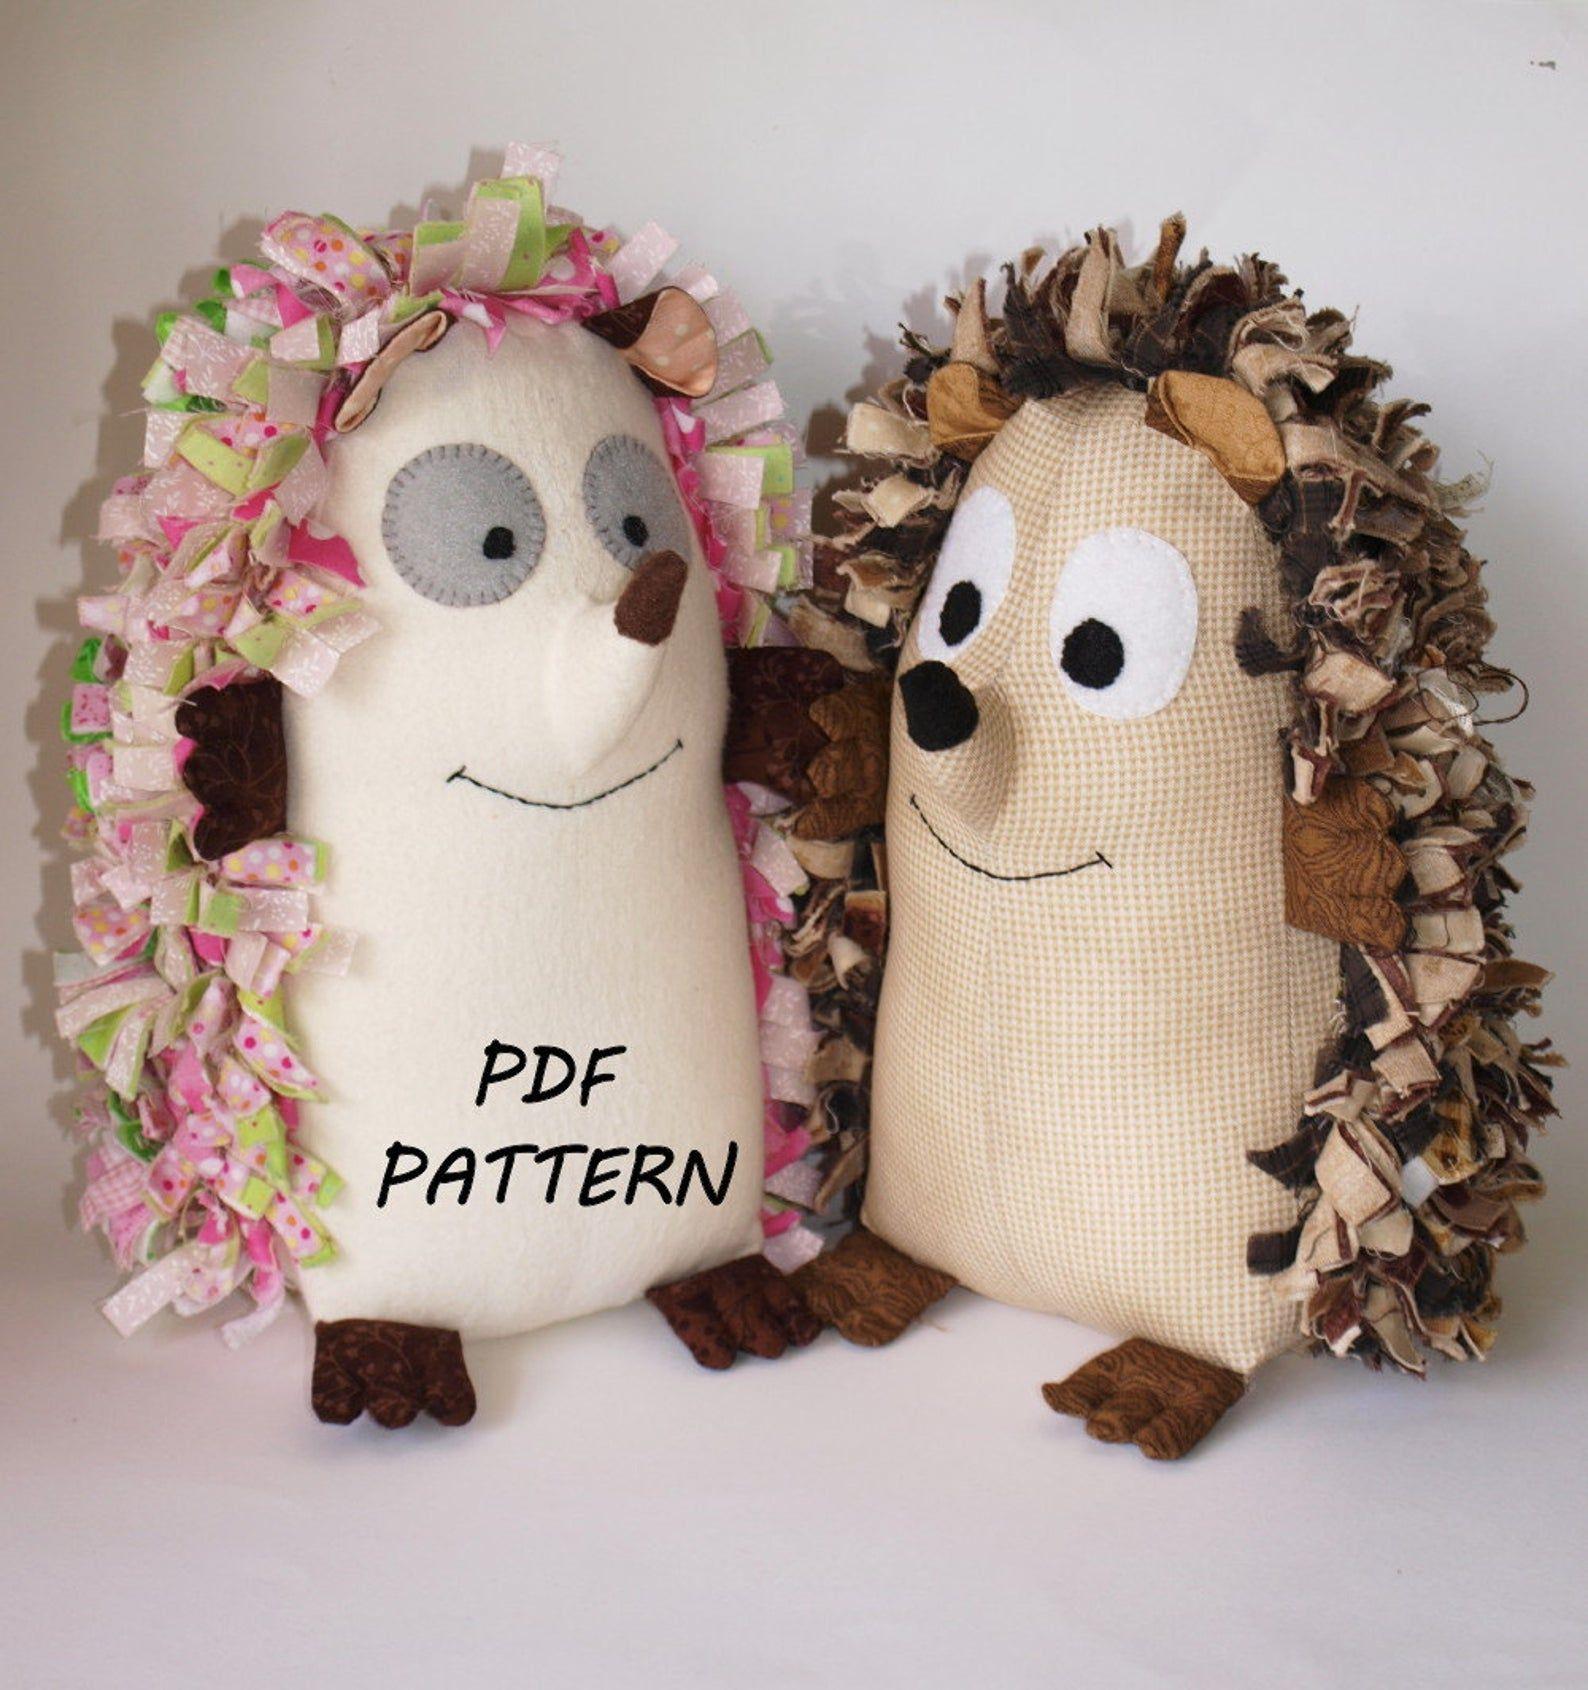 Hedgehog Pdf Sewing Pattern Soft Toy Echidna Porcupine Etsy Soft Toy Patterns Sewing Patterns Stuffed Animal Patterns [ 1690 x 1588 Pixel ]